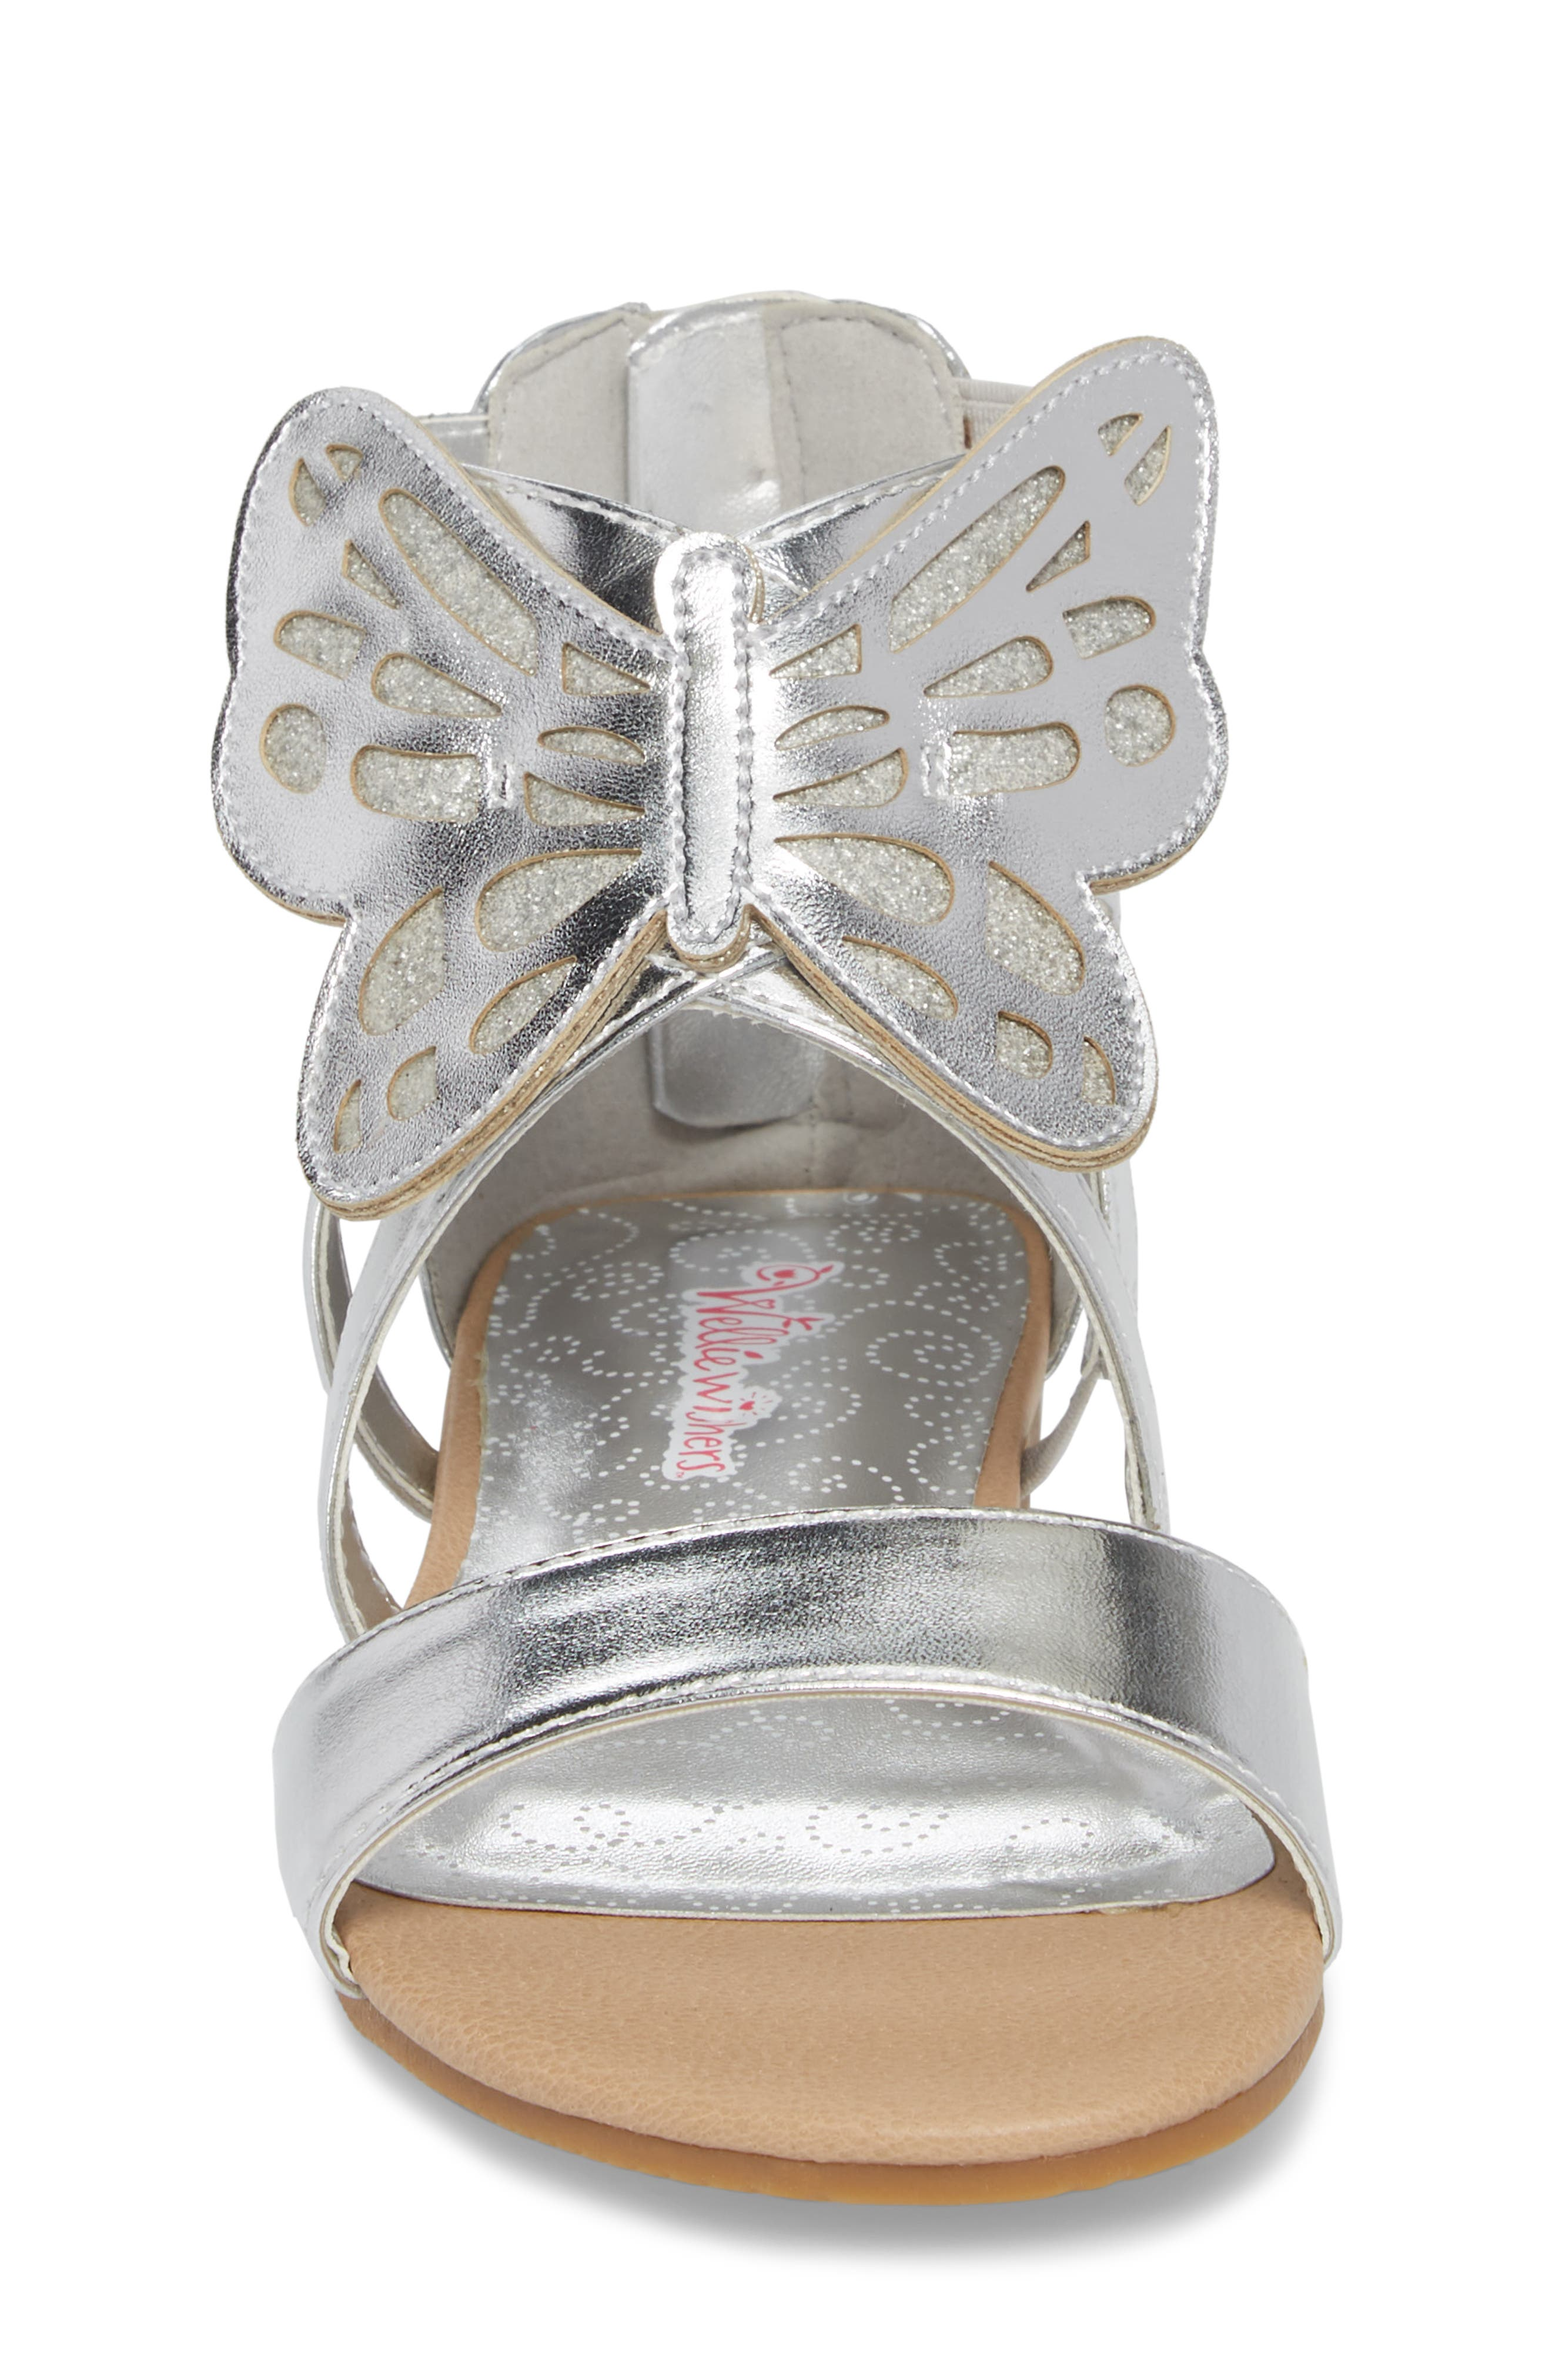 Willa Flutter Metallic Sandal,                             Alternate thumbnail 4, color,                             Silver Metallic